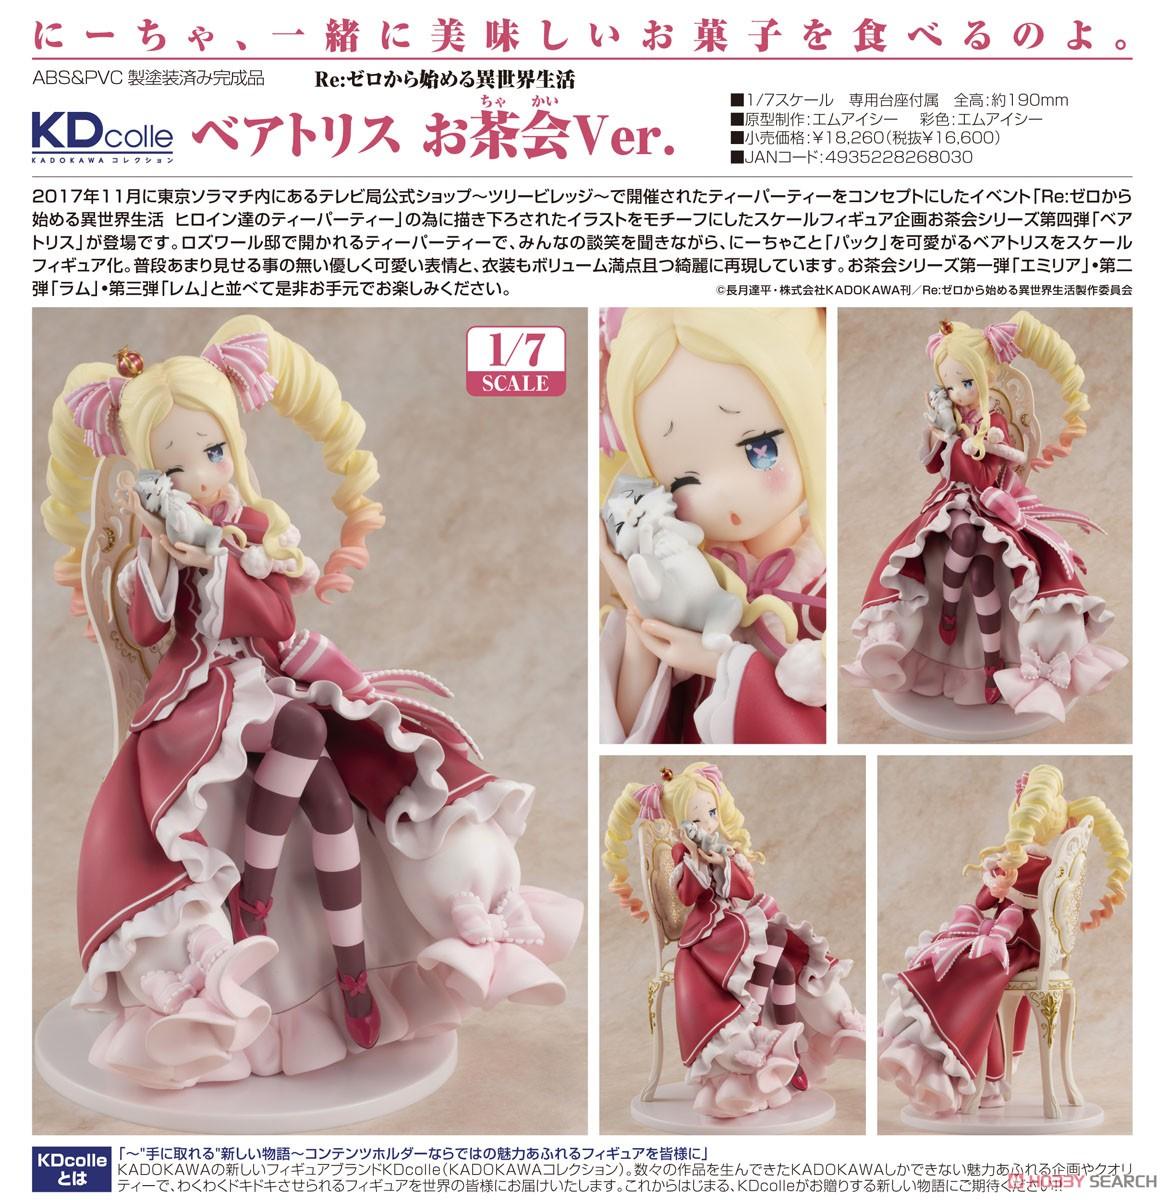 KDcolle『ベアトリス お茶会Ver.』Re:ゼロから始める異世界生活 1/7 完成品フィギュア-006